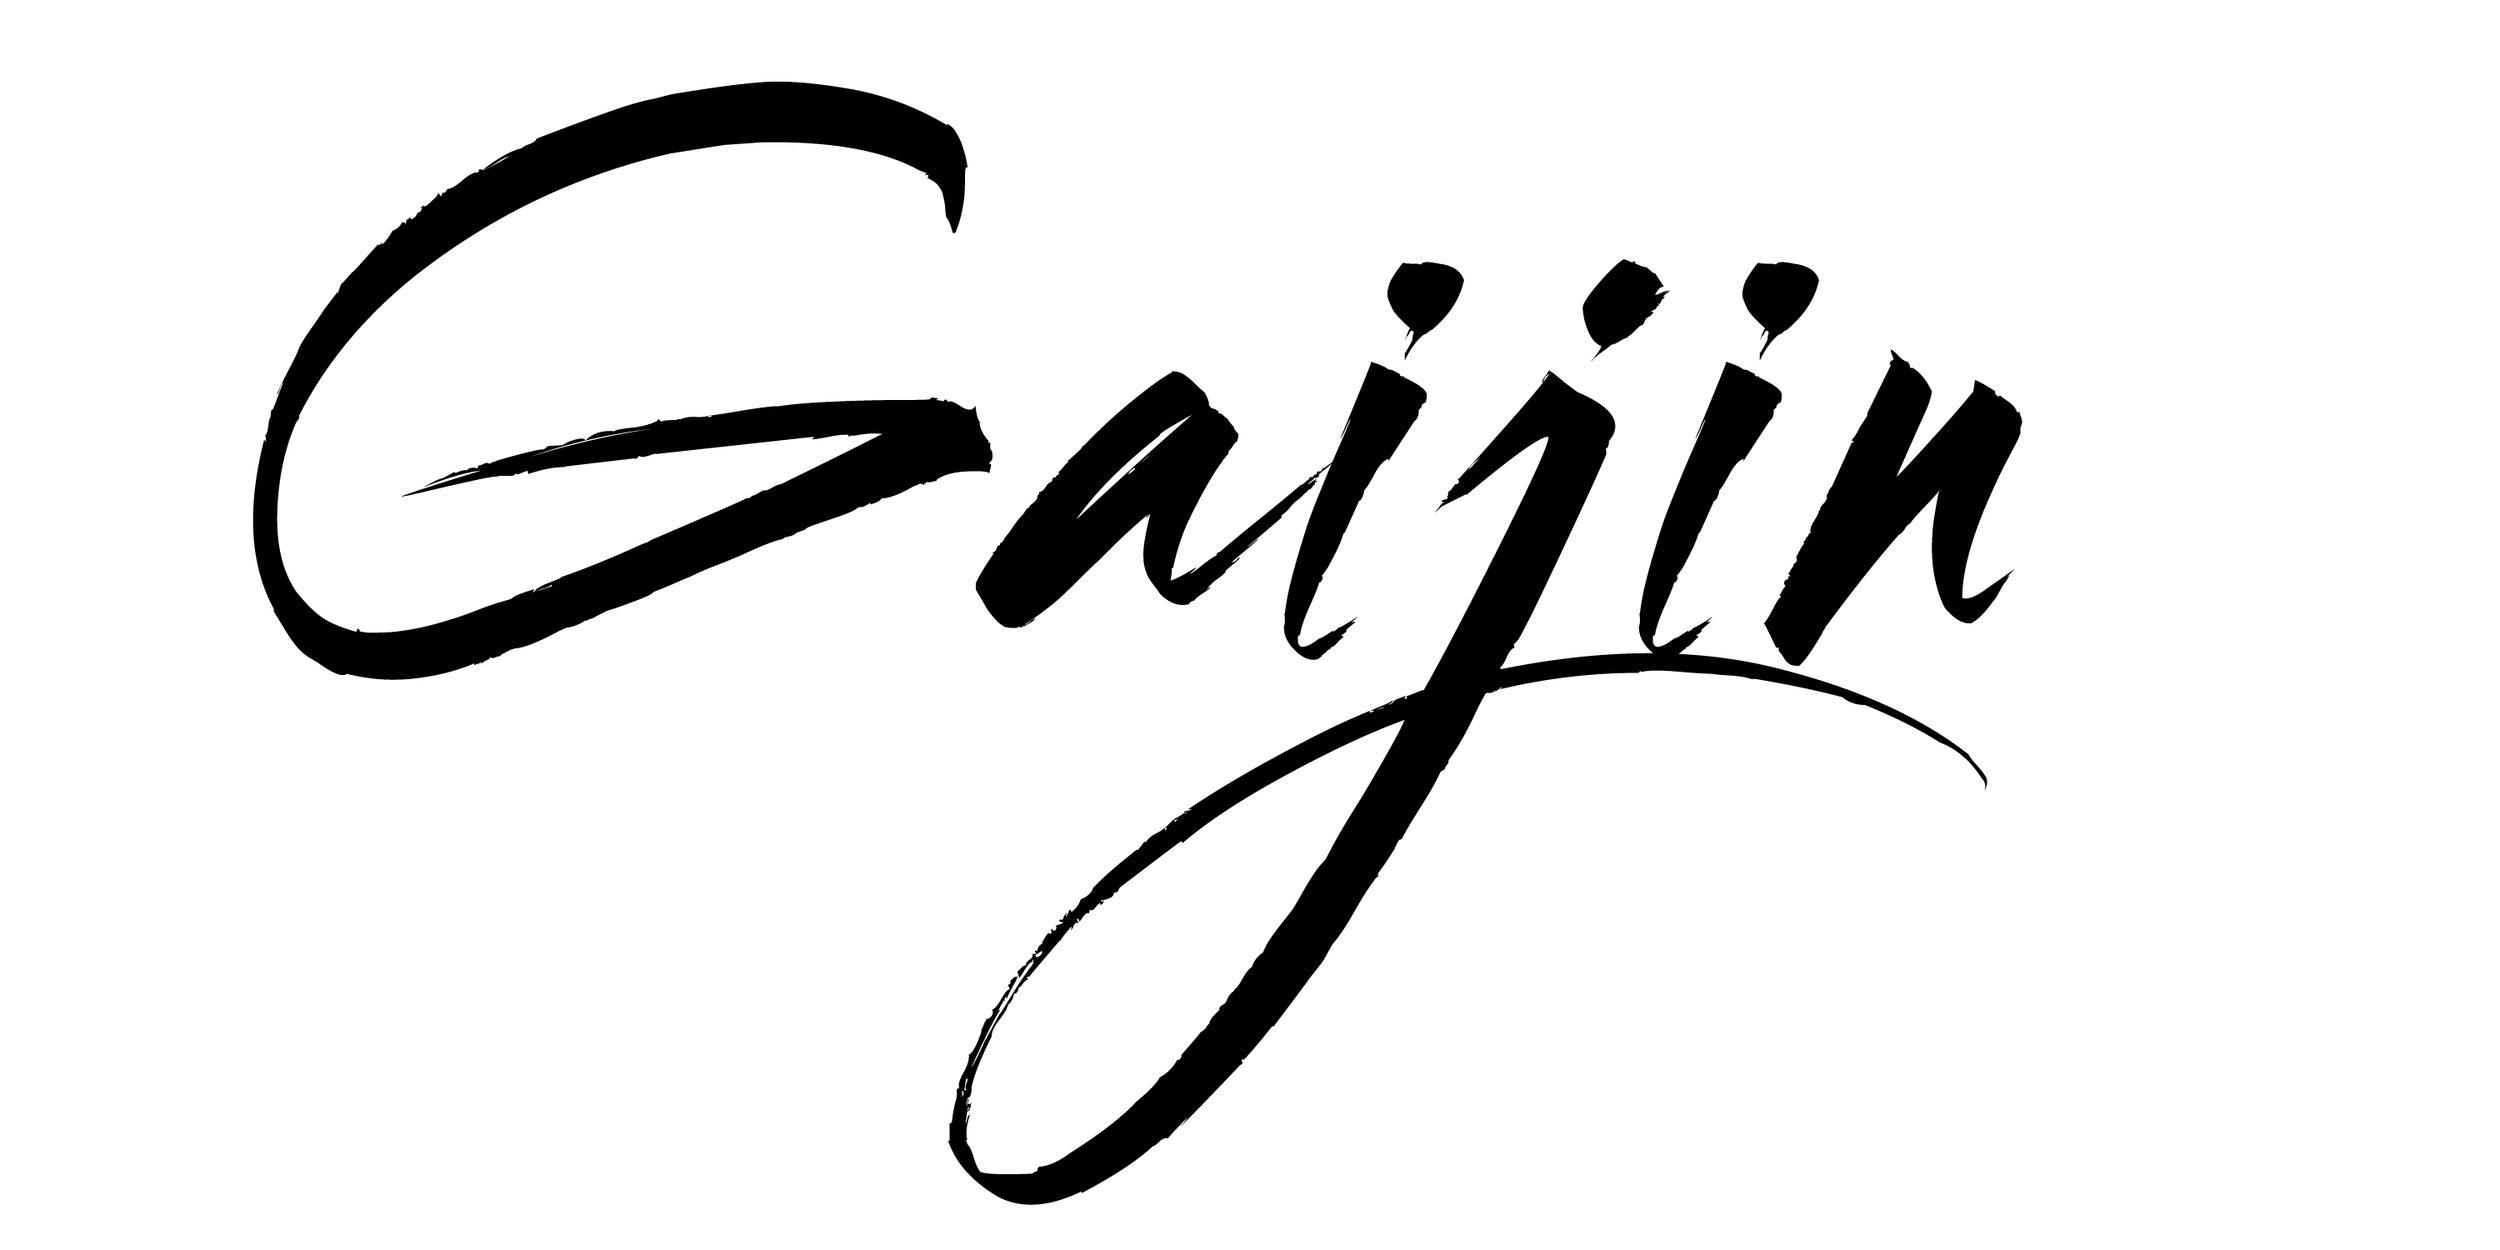 Copy of gaijin logo.jpg